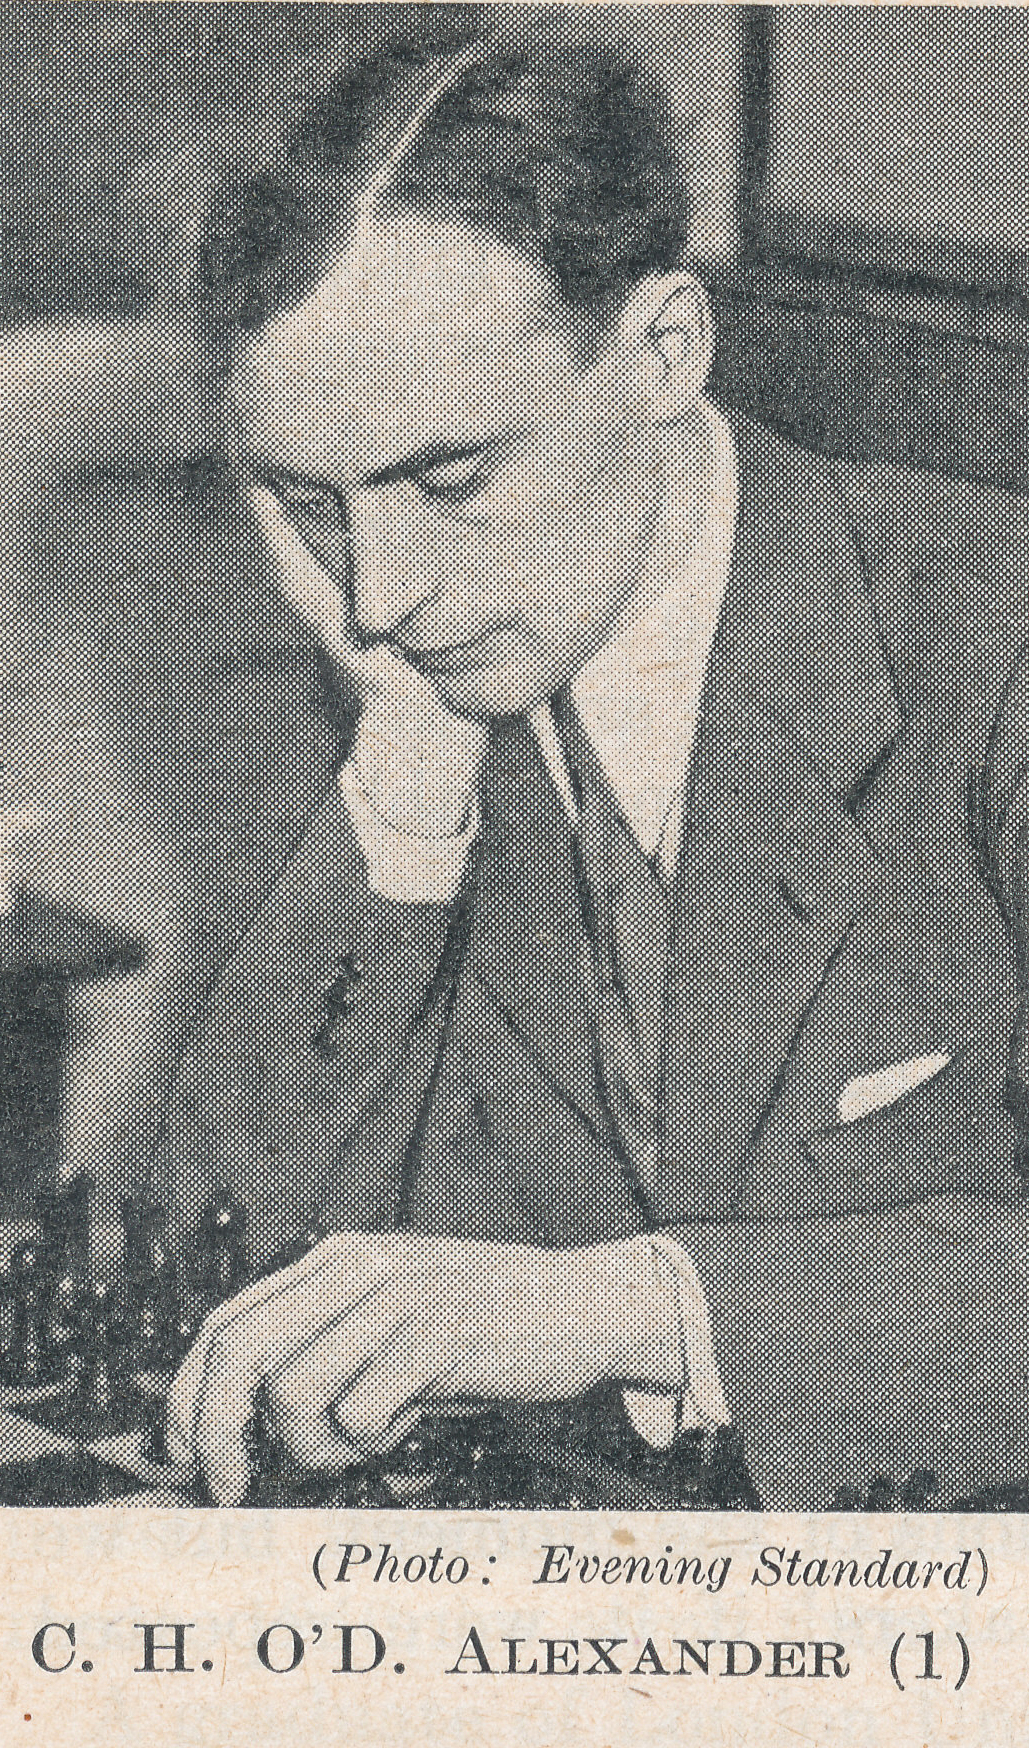 IM Conel Hugh O'Donel Alexander CMG CBE (19-iv-1909 15-ii-1974). Source : The Anglo-Soviet Radio Chess Match